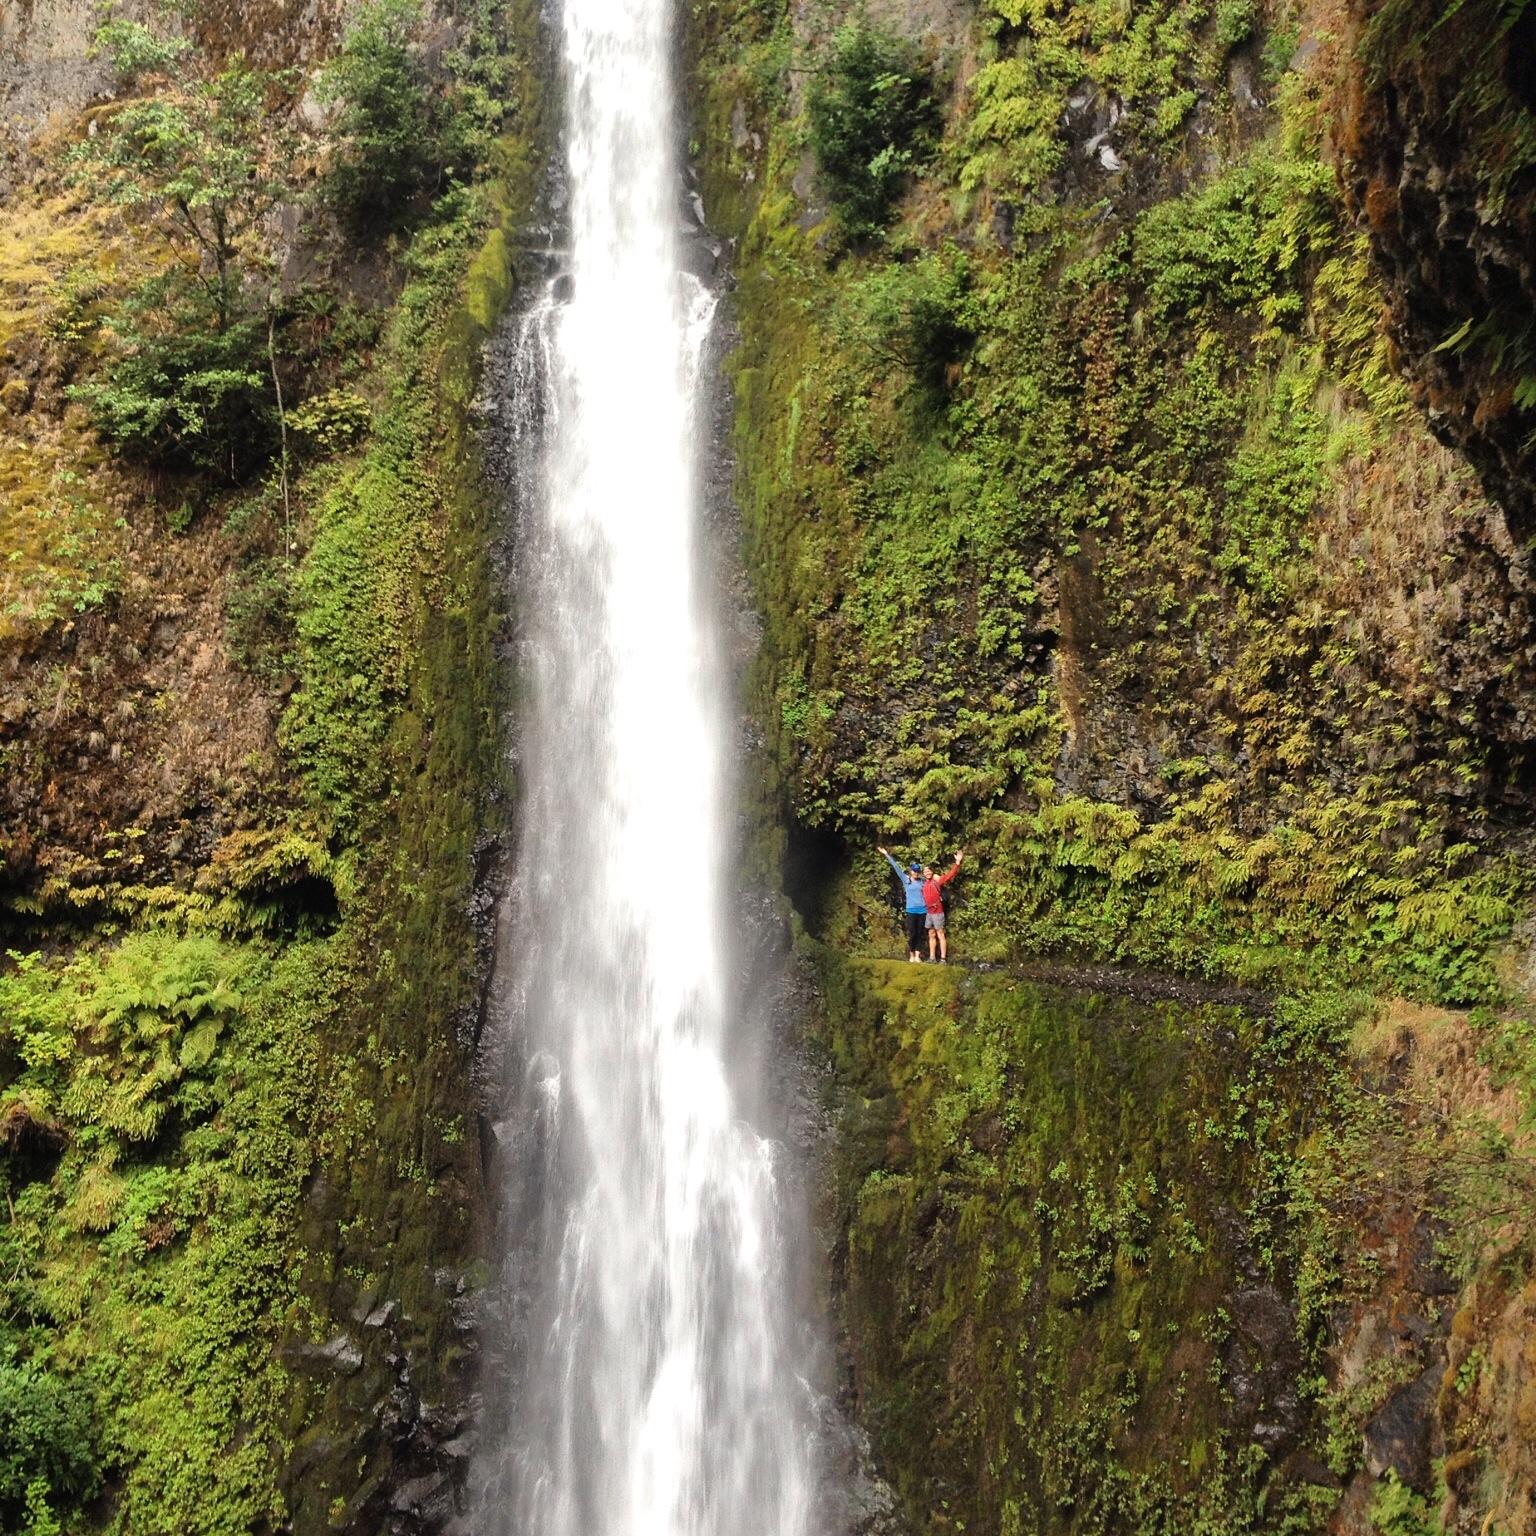 Trail run to Tunnel Falls, Hood River Fall